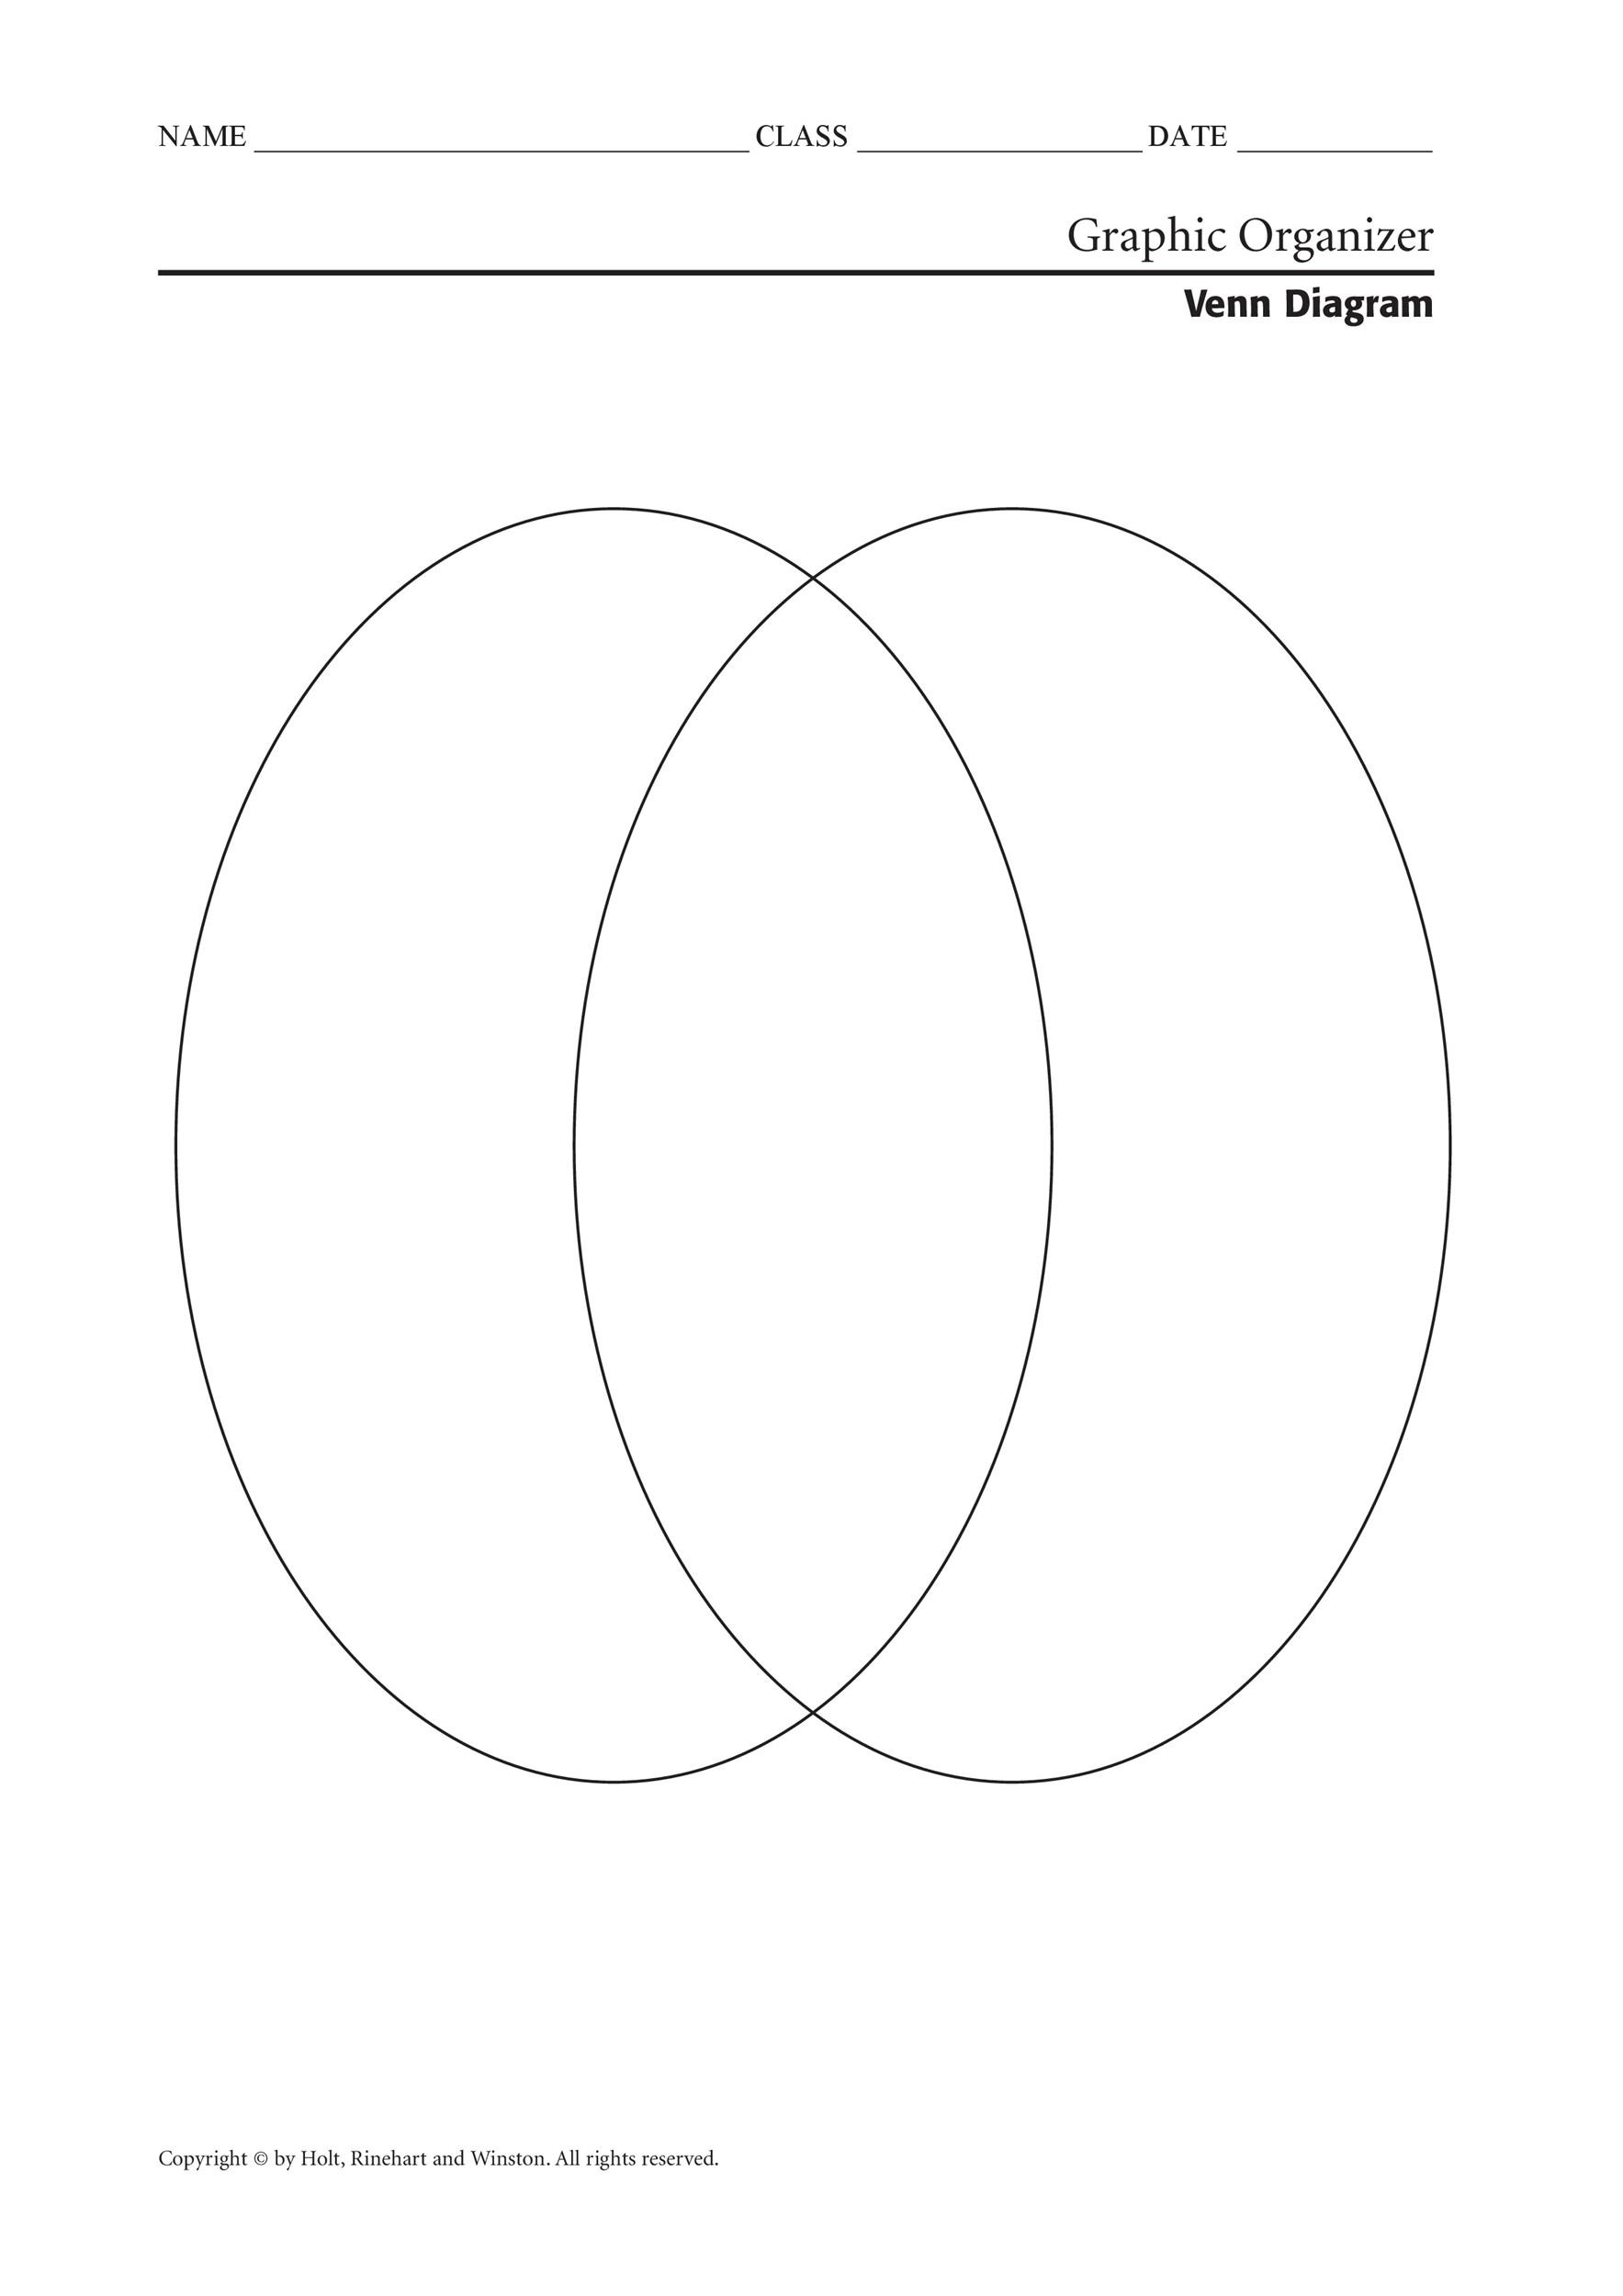 Printable Venn Diagram 2 Circles